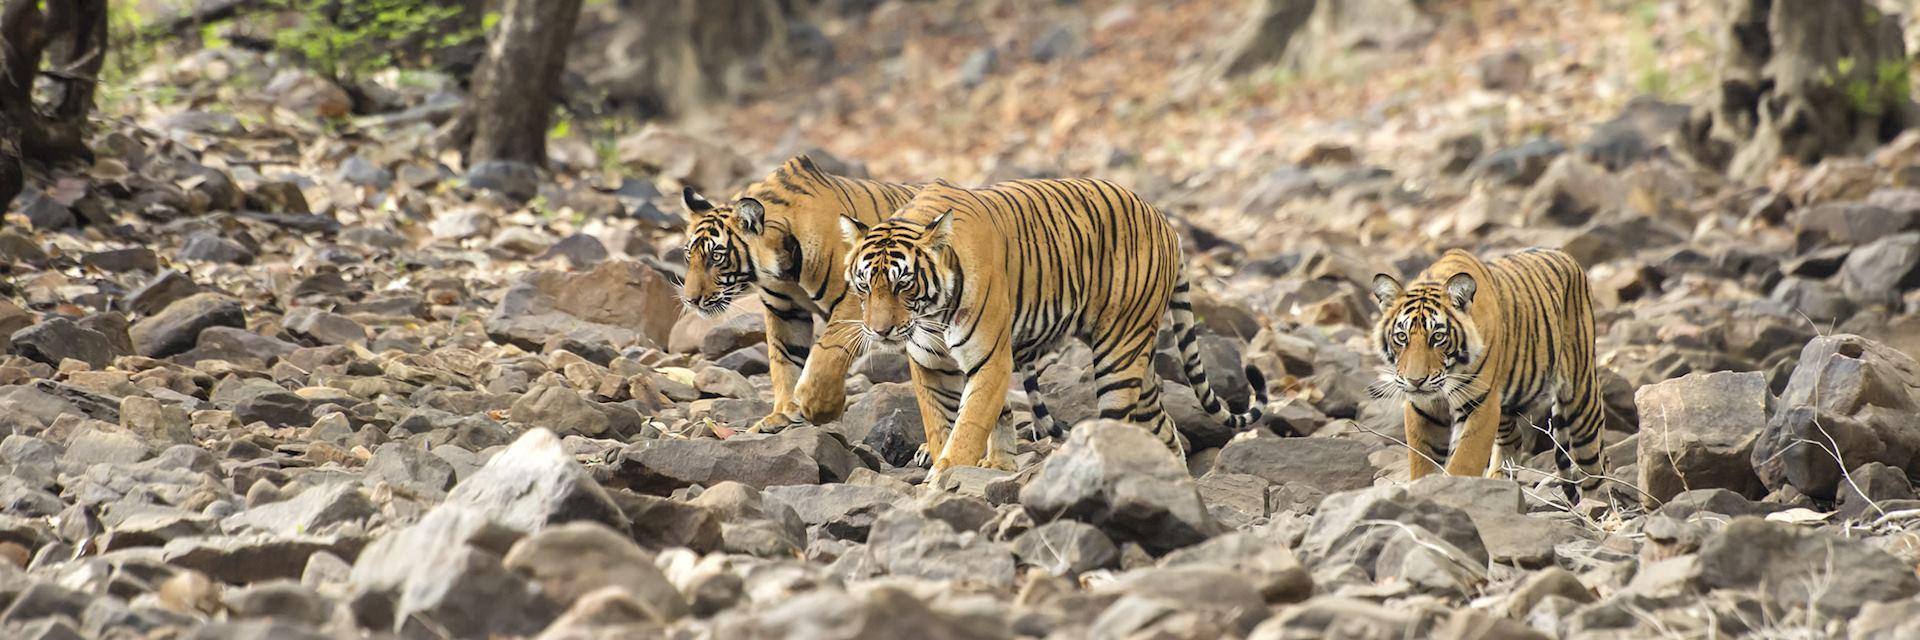 Tigers, Ranthambore National Park